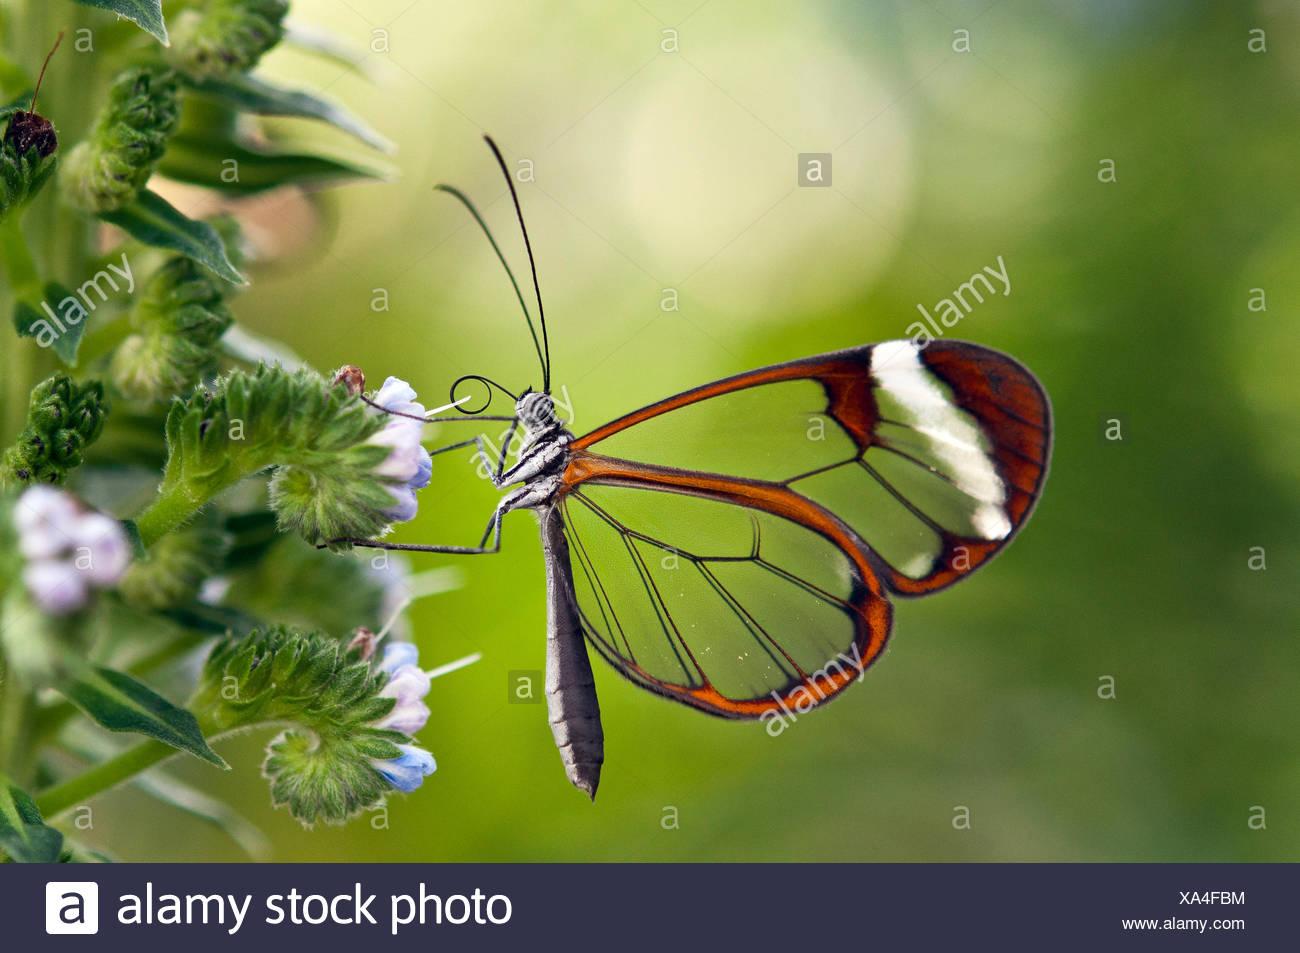 Glasswinged Butterfly In Butterfly House Stock Photo 281612344 Alamy